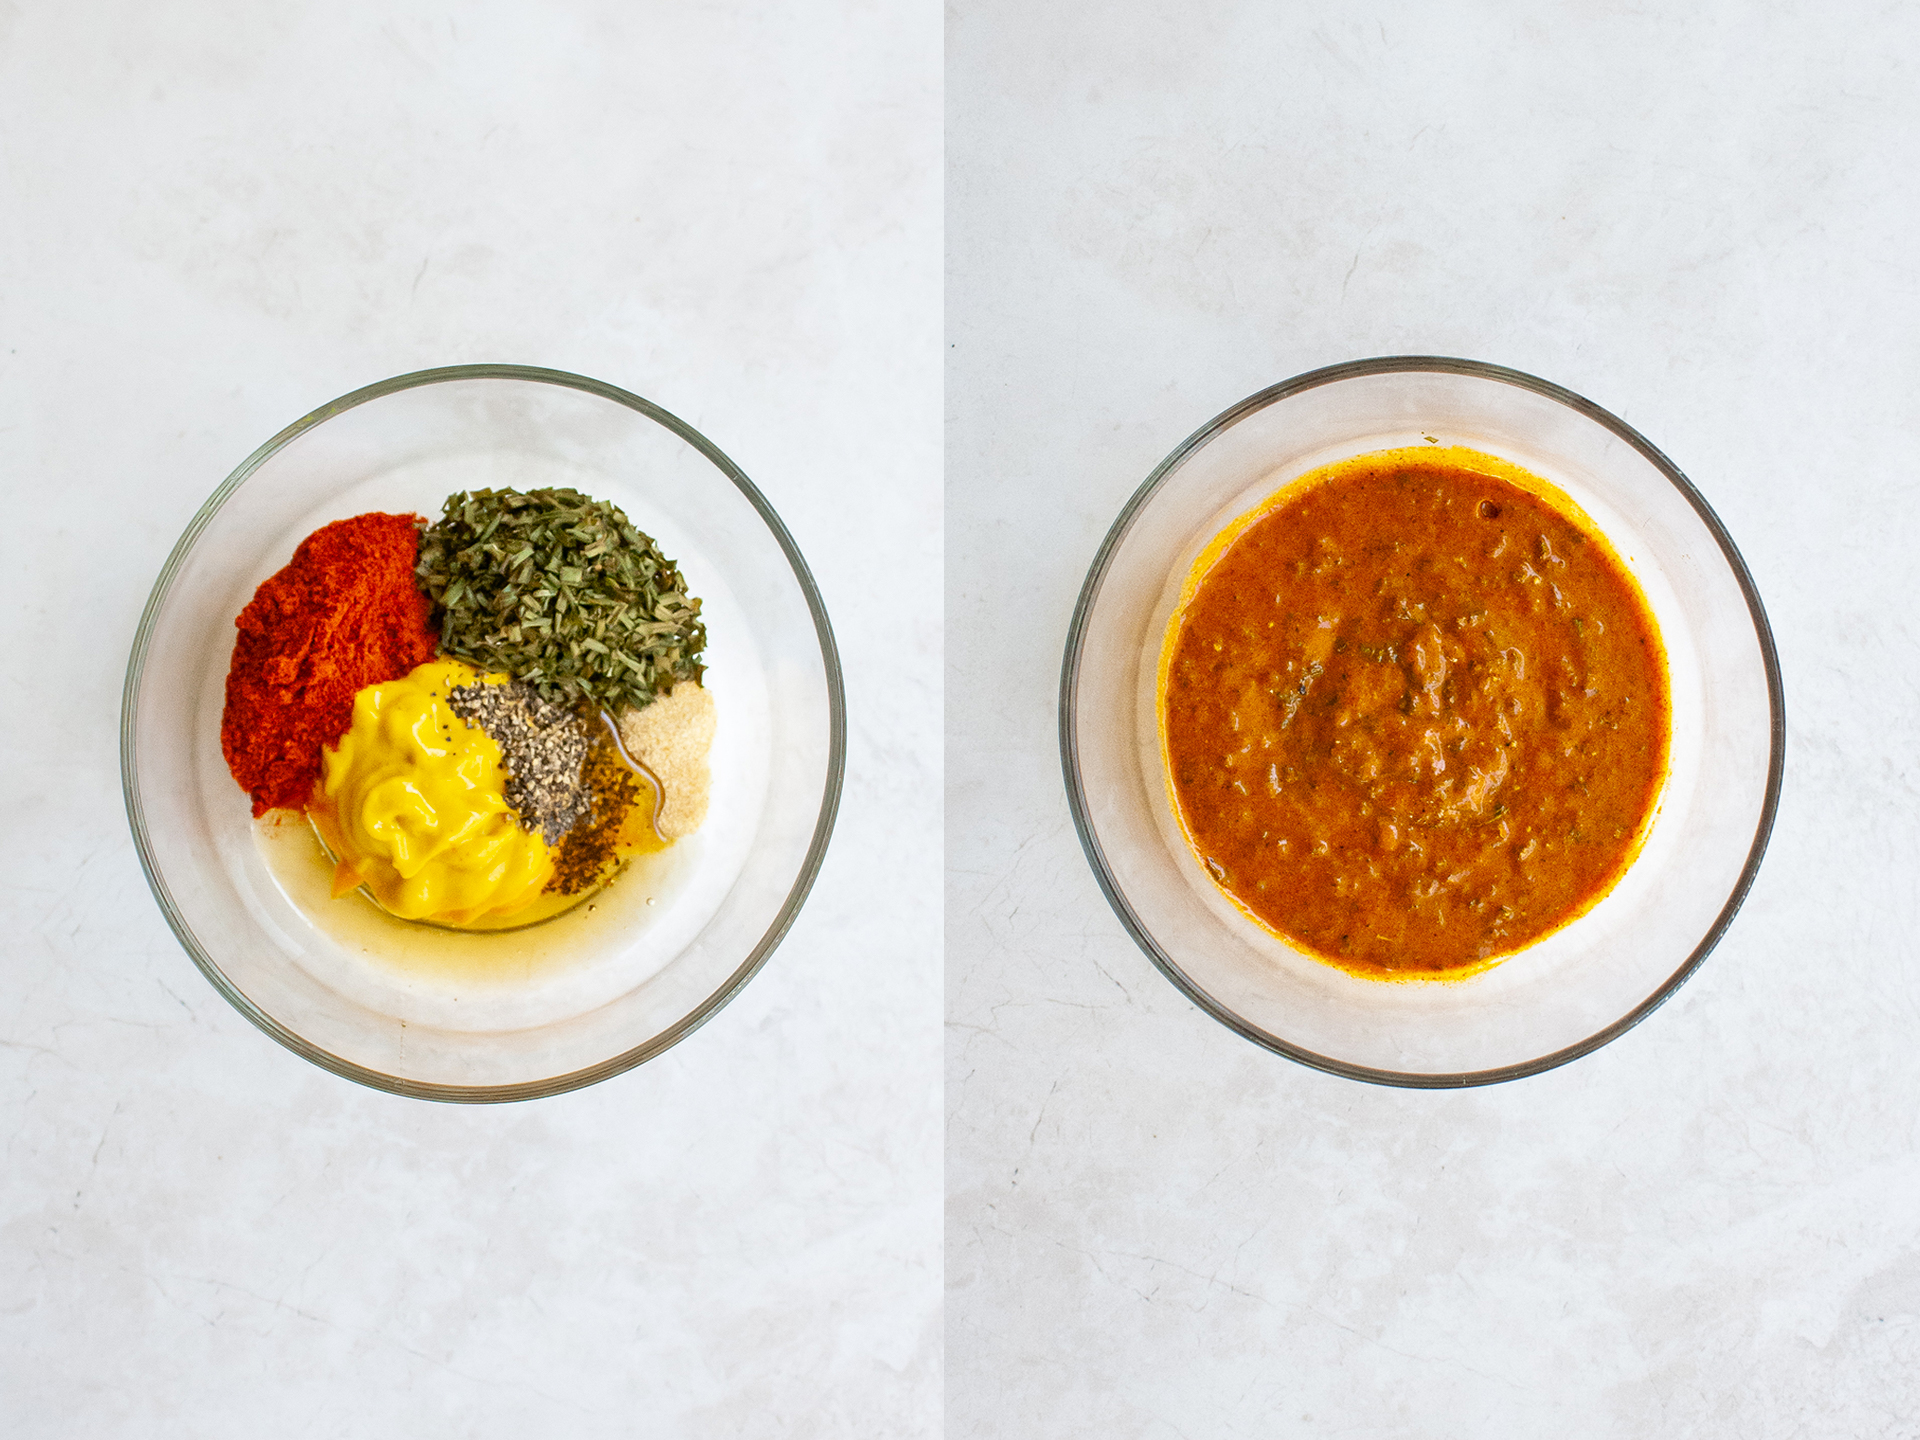 Honey and paprika glaze mixture